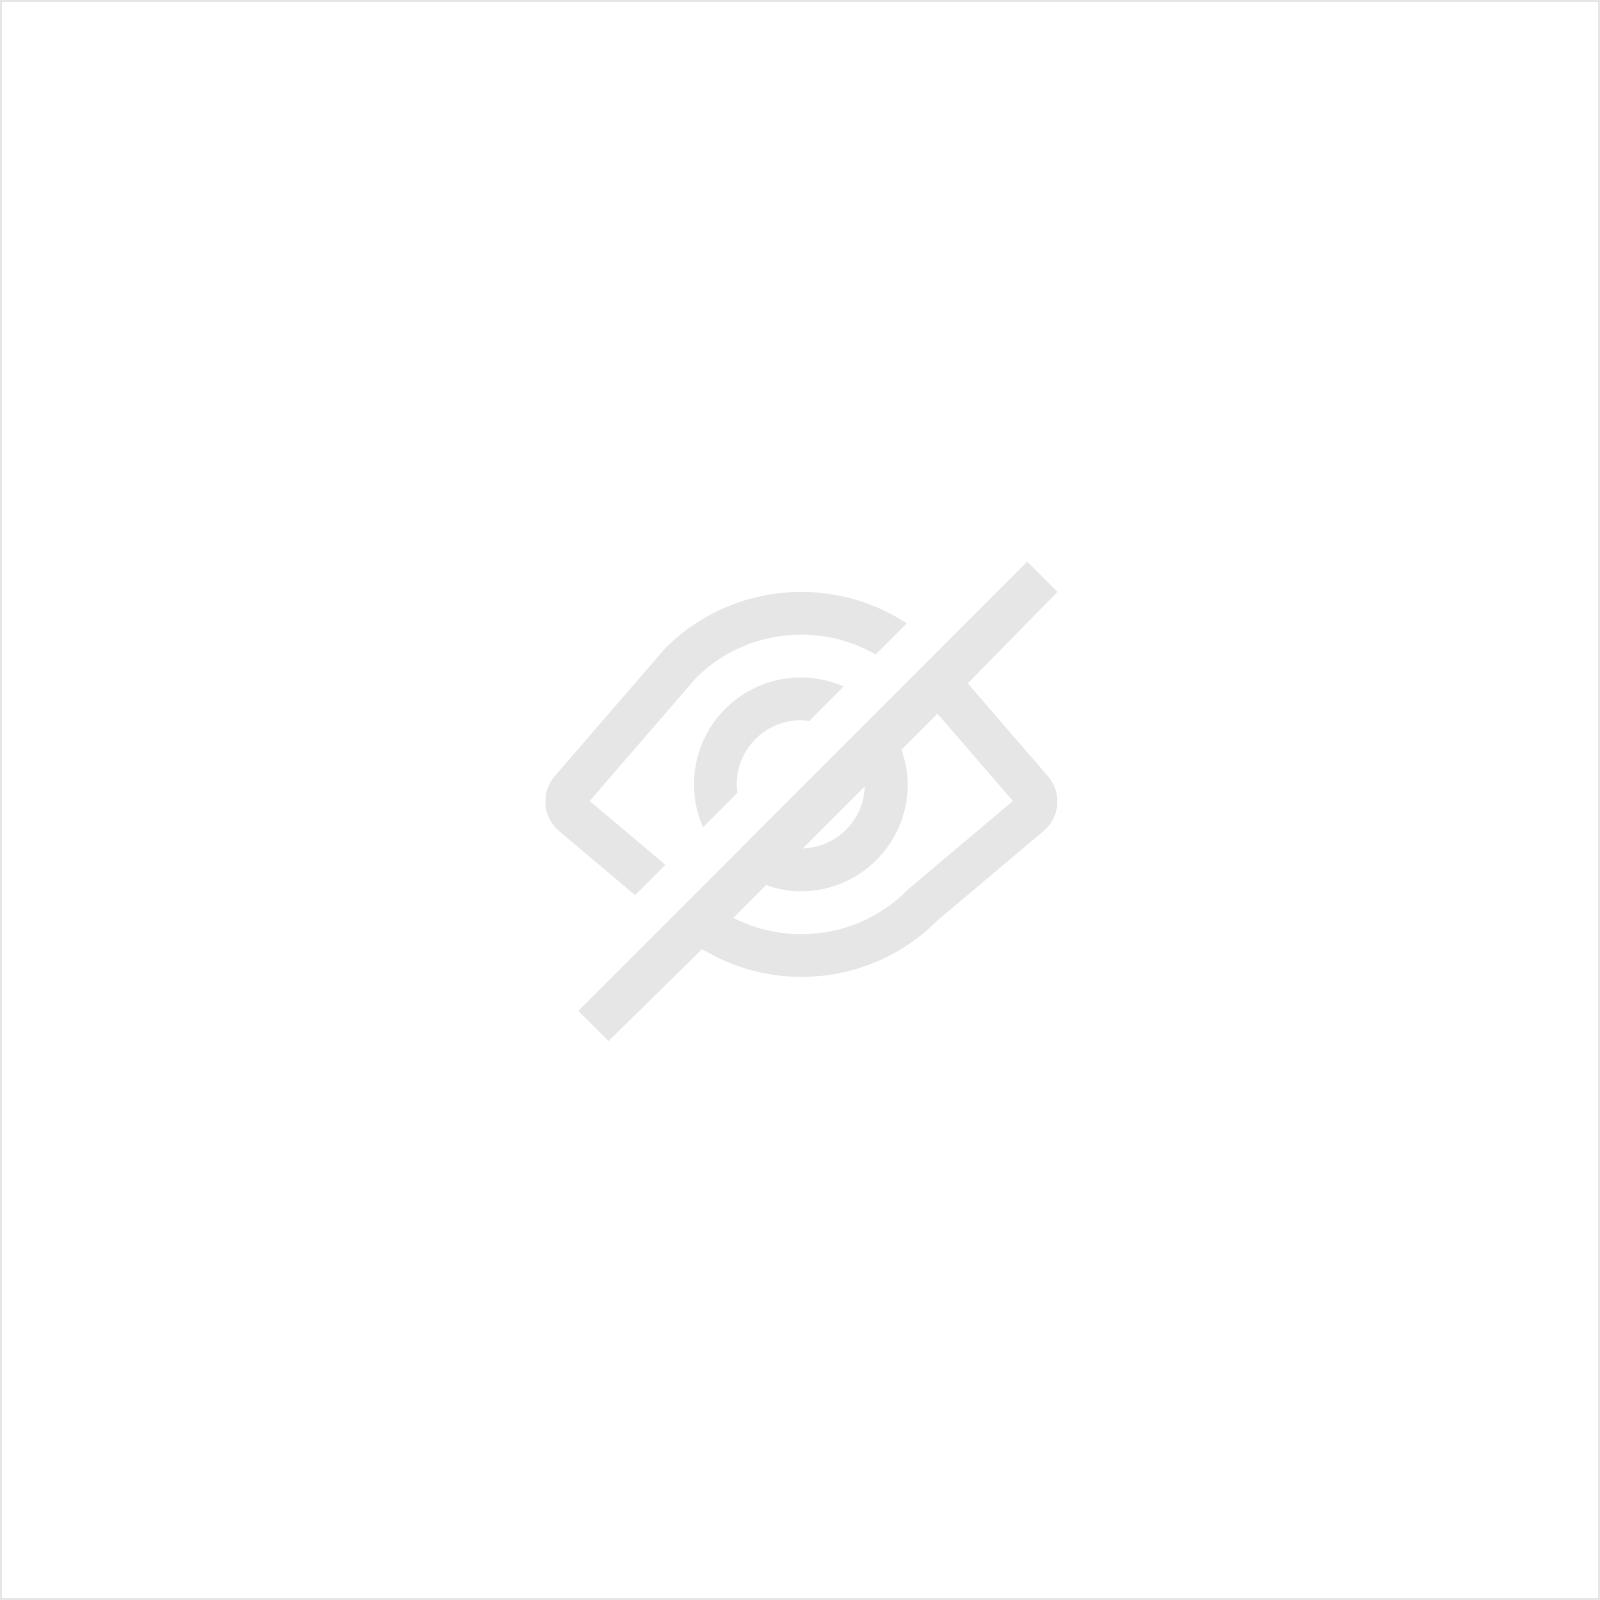 ABRASIF GRENAT GRADE A+ POUR SABLEUSE A PRESSION PALETTE 1000